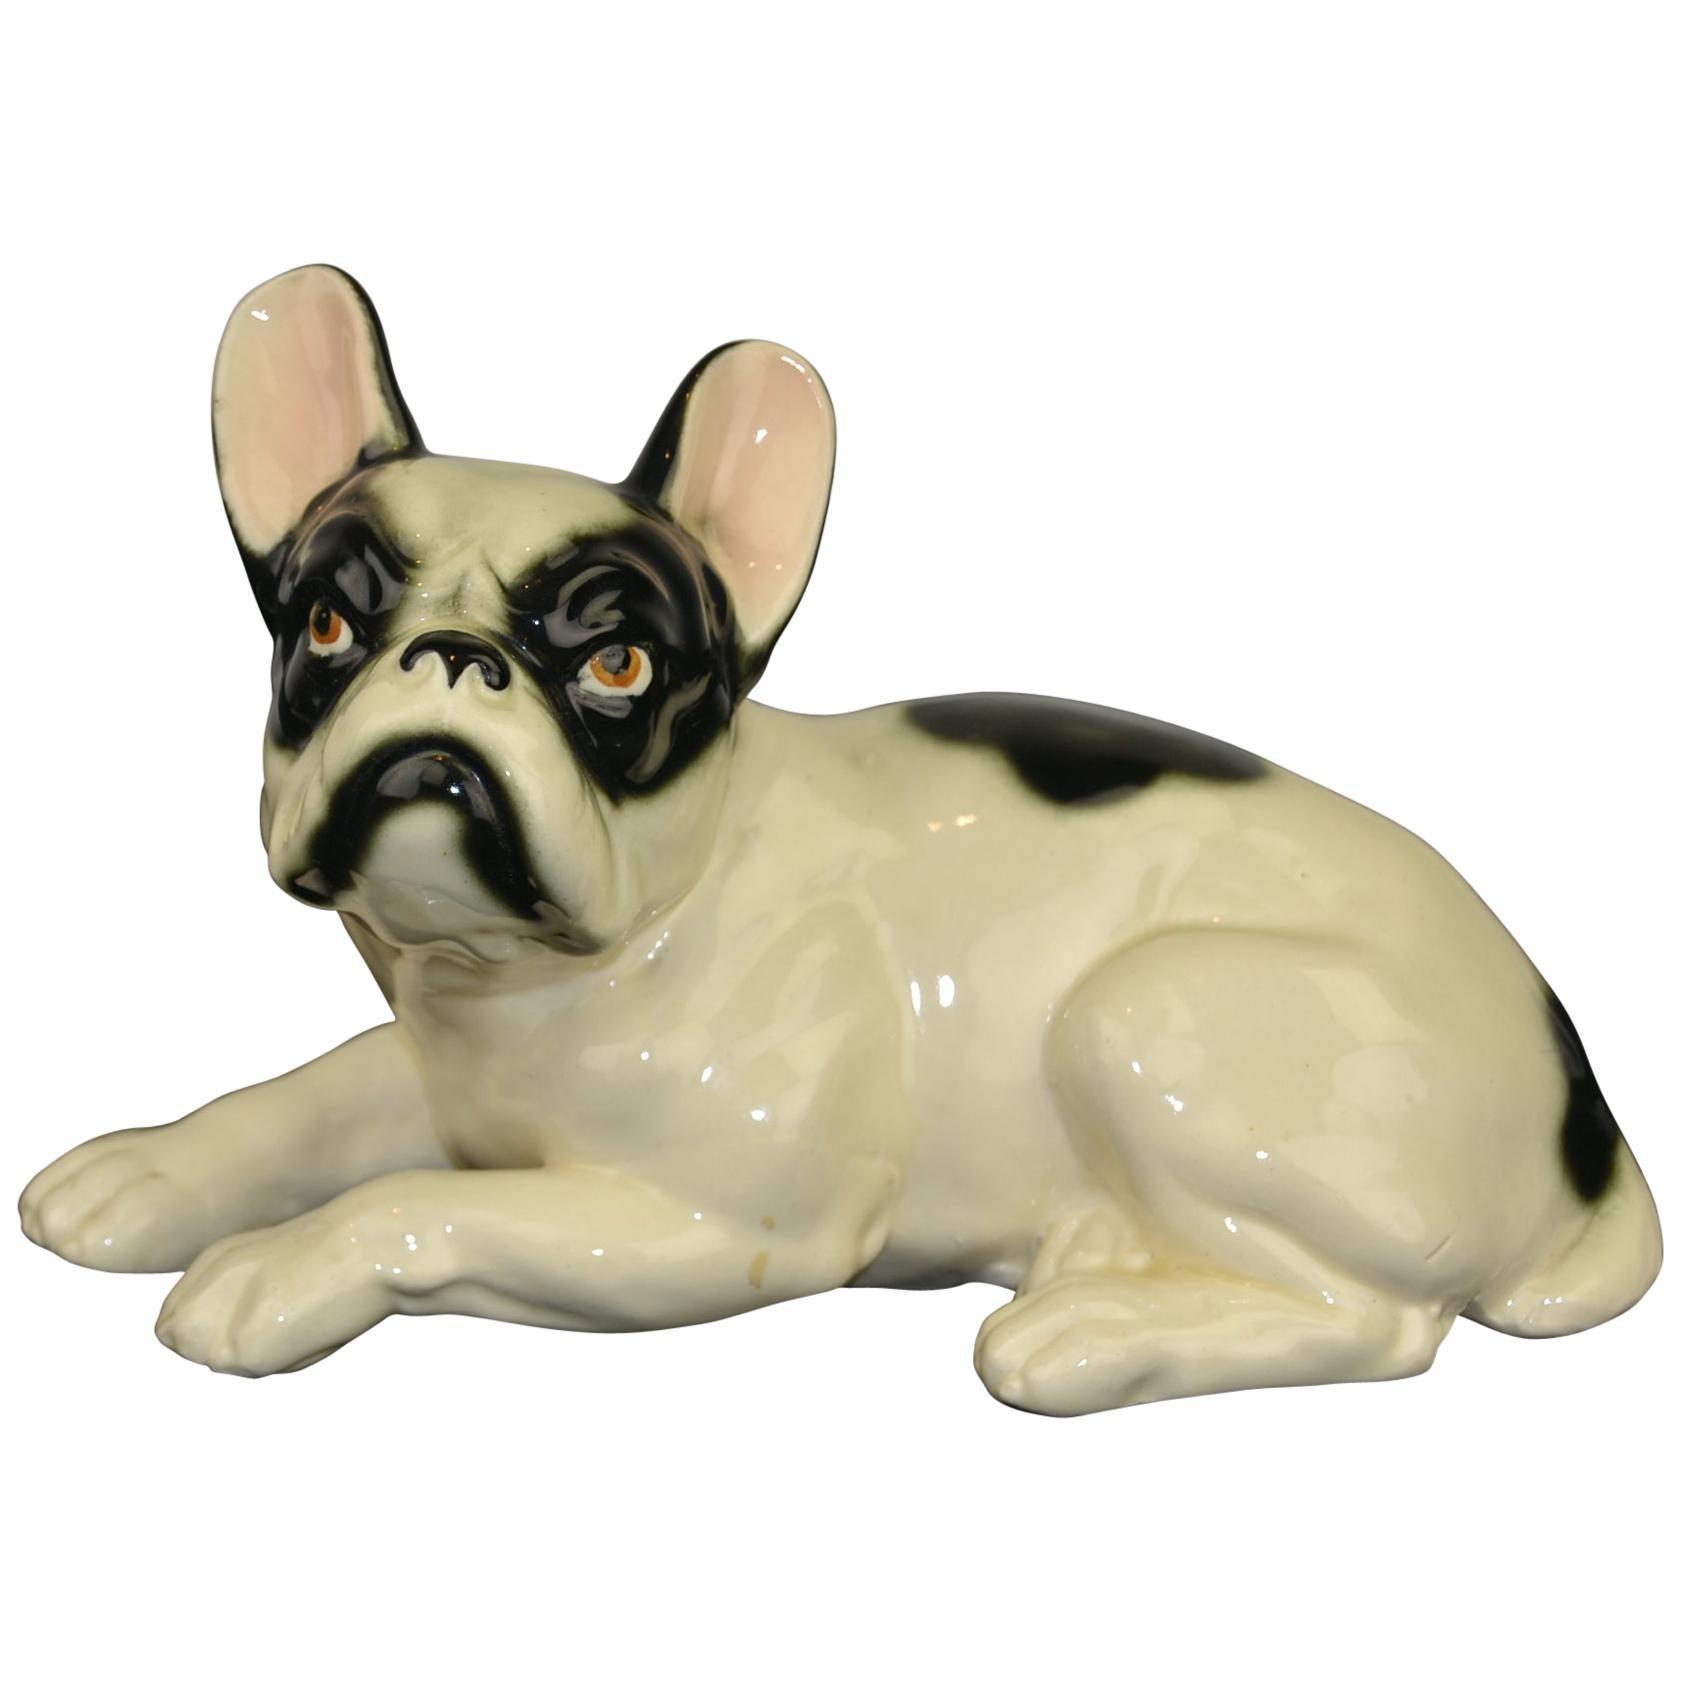 Art Deco Porcelain French Bulldog, Germany, 1930s